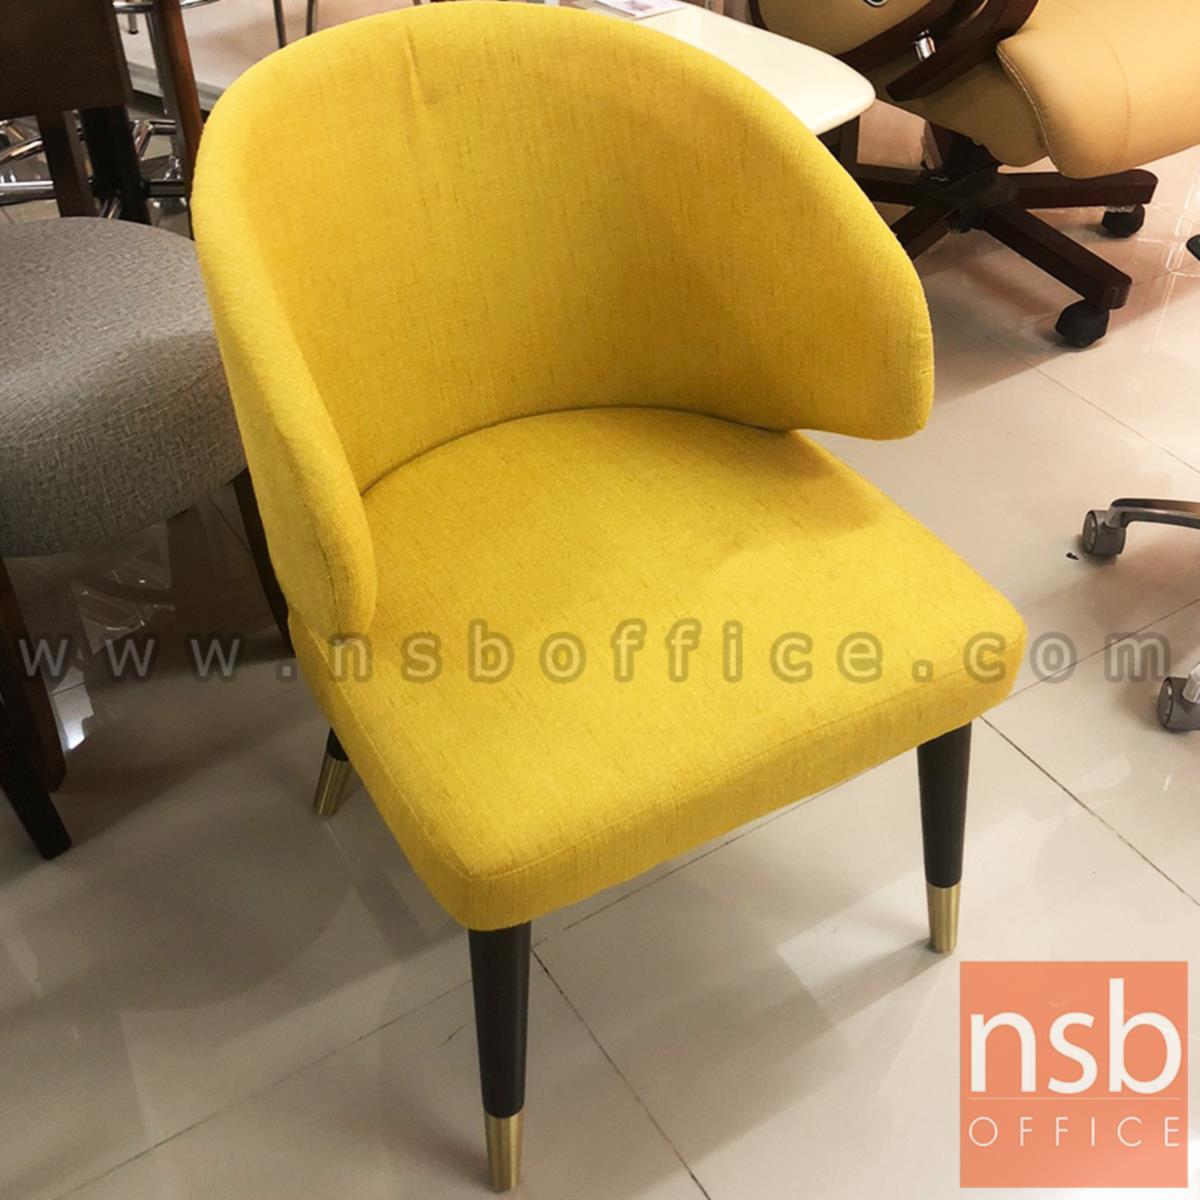 B29A376:เก้าอี้โมเดิร์นหุ้มผ้า รุ่น Coldplay (โคลเพลย์)  โครงขาเหล็ก